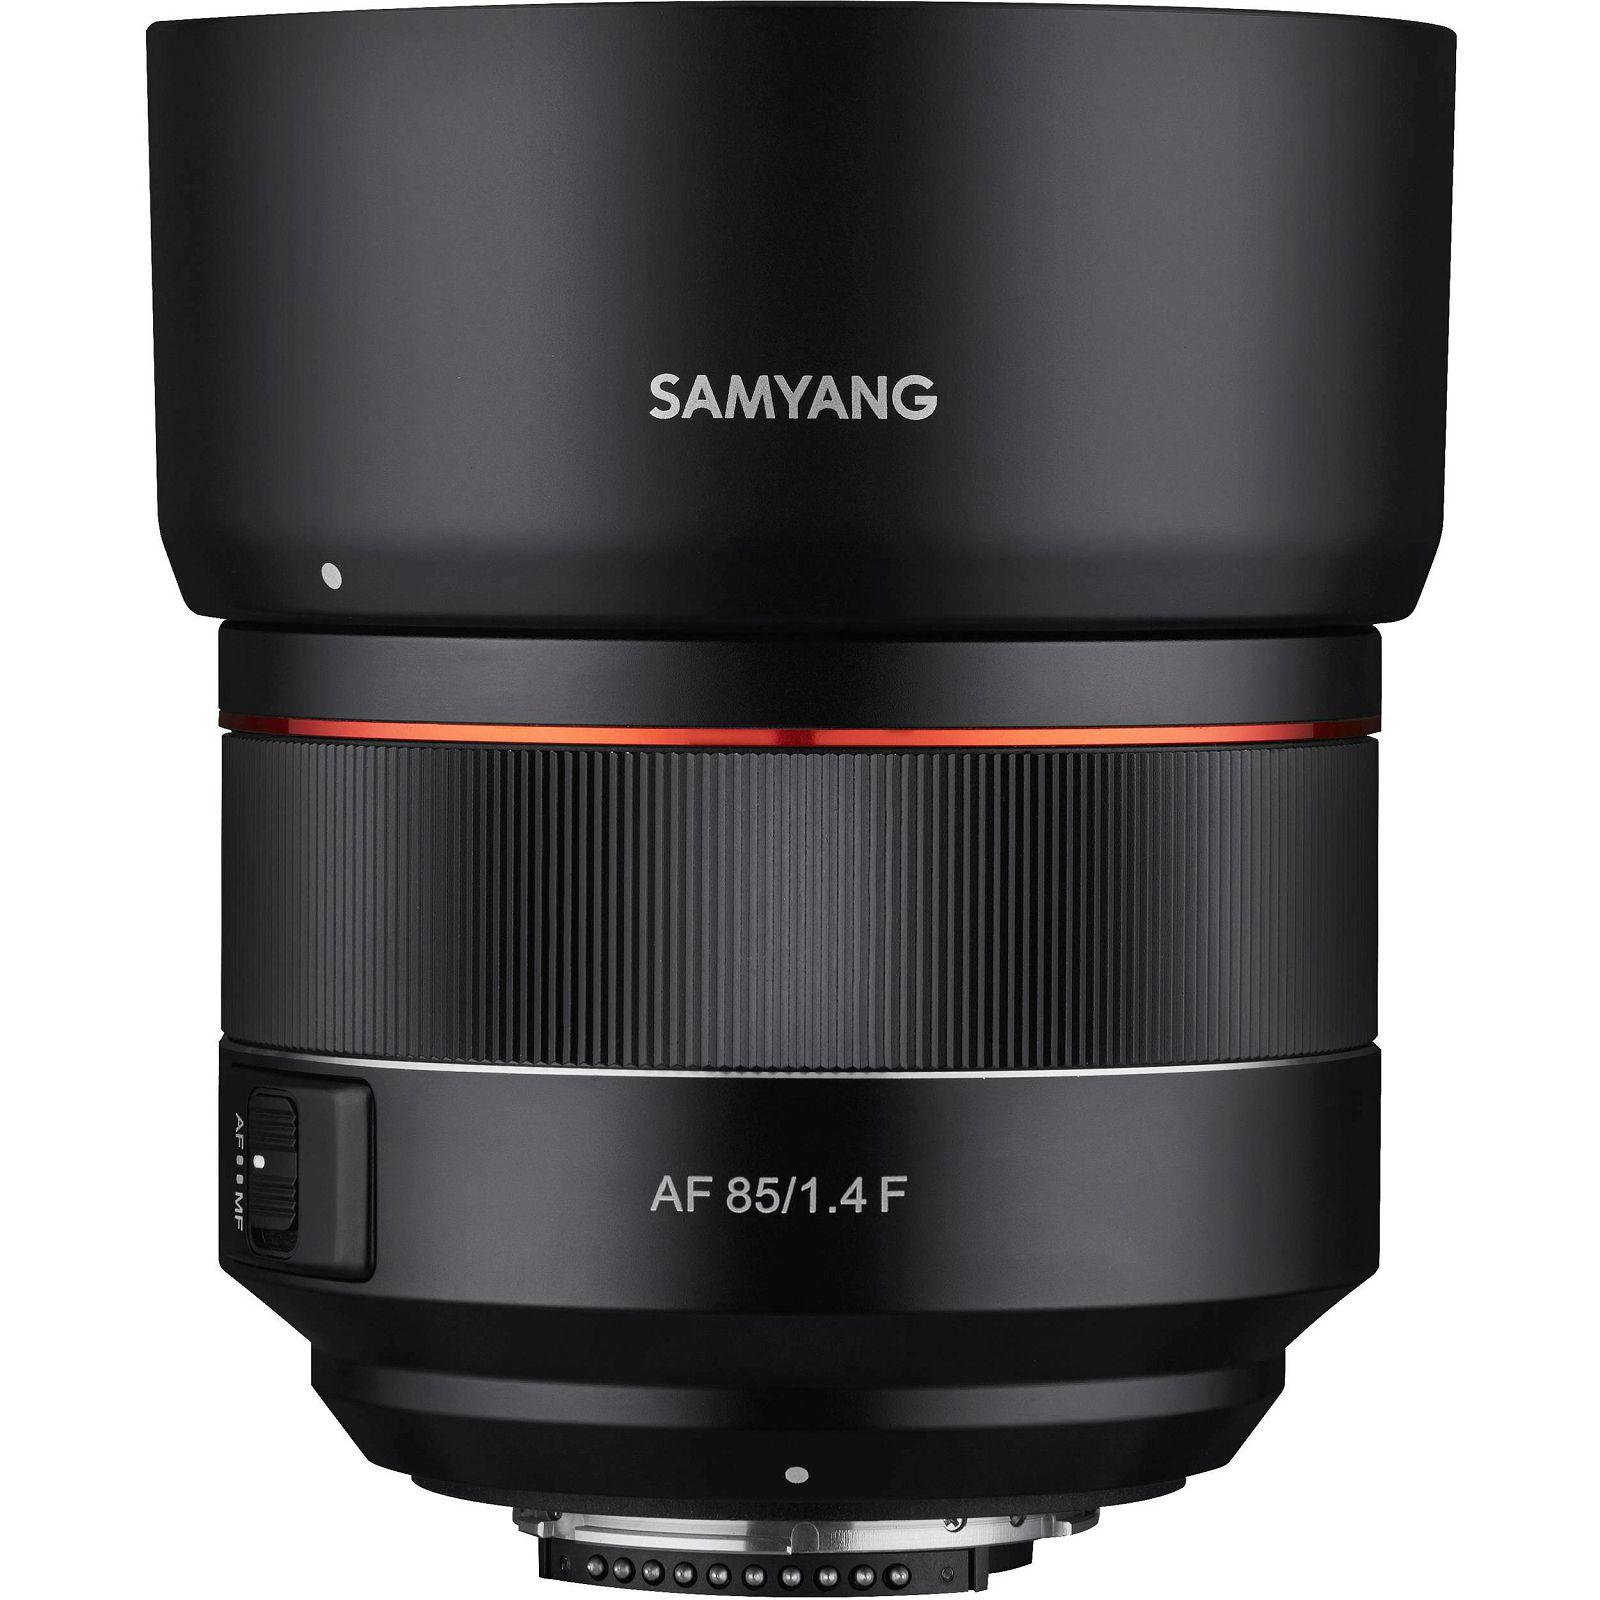 Samyang AF 85mm f/1.4 Auto focus portretni telefoto objektiv za Nikon FX